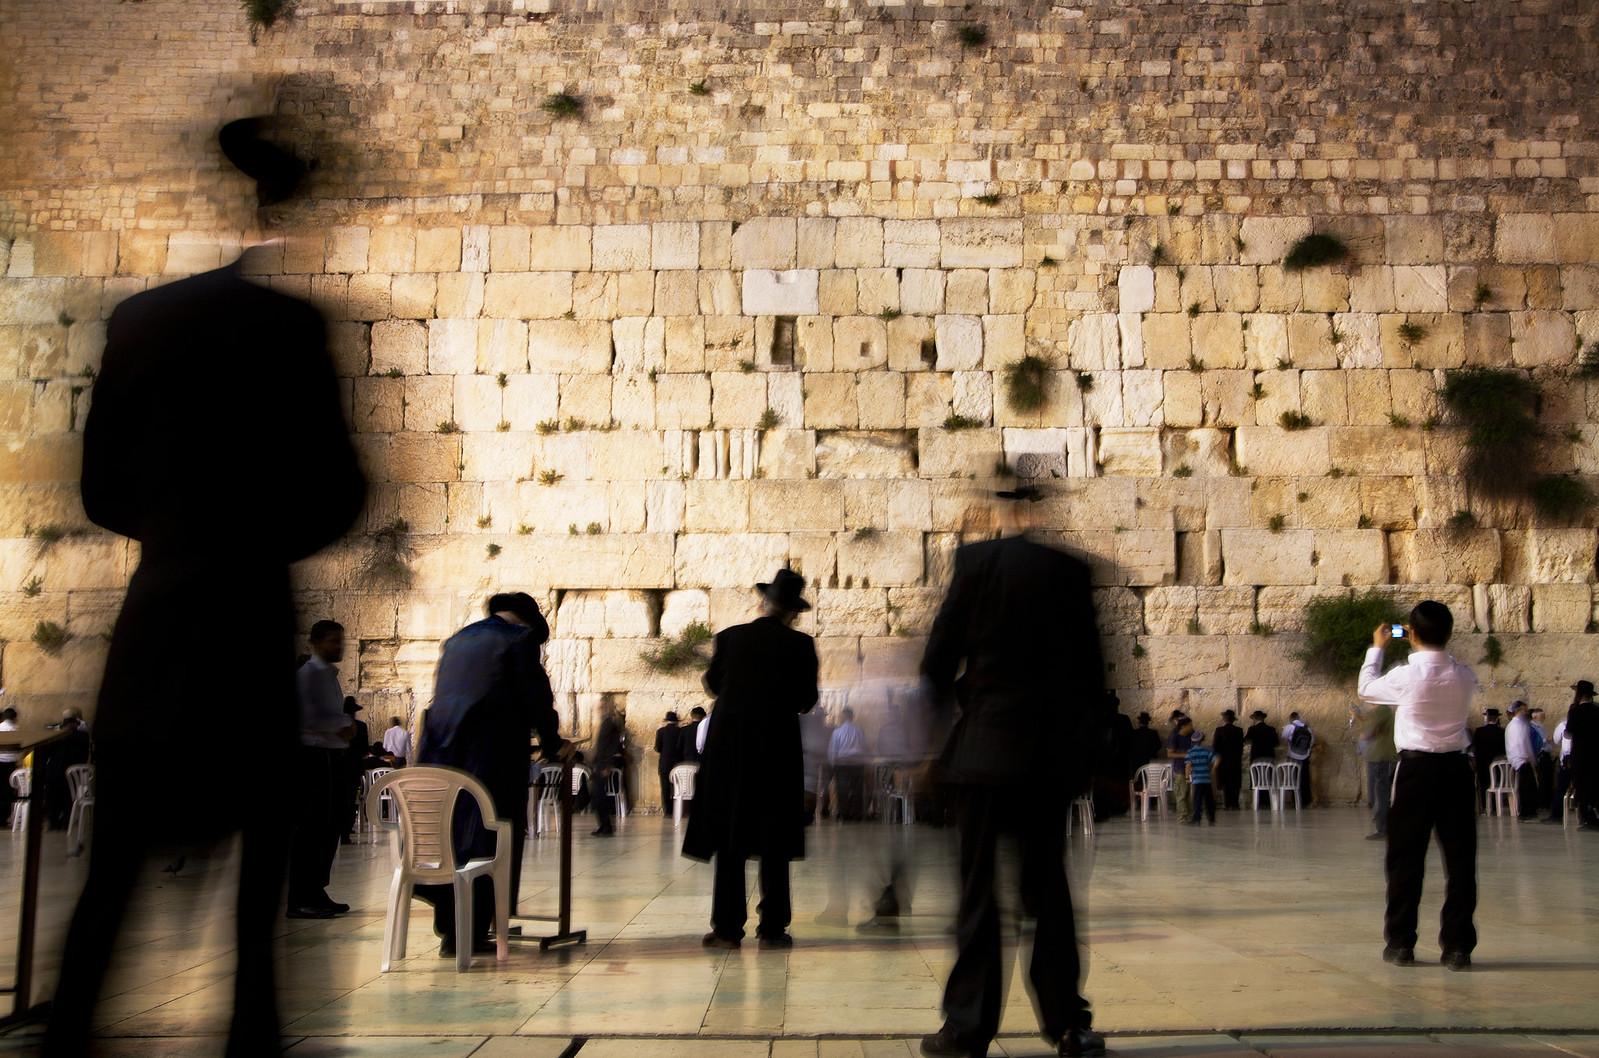 Jerusalem_Western Wall_6_Noam Chen_IMOT